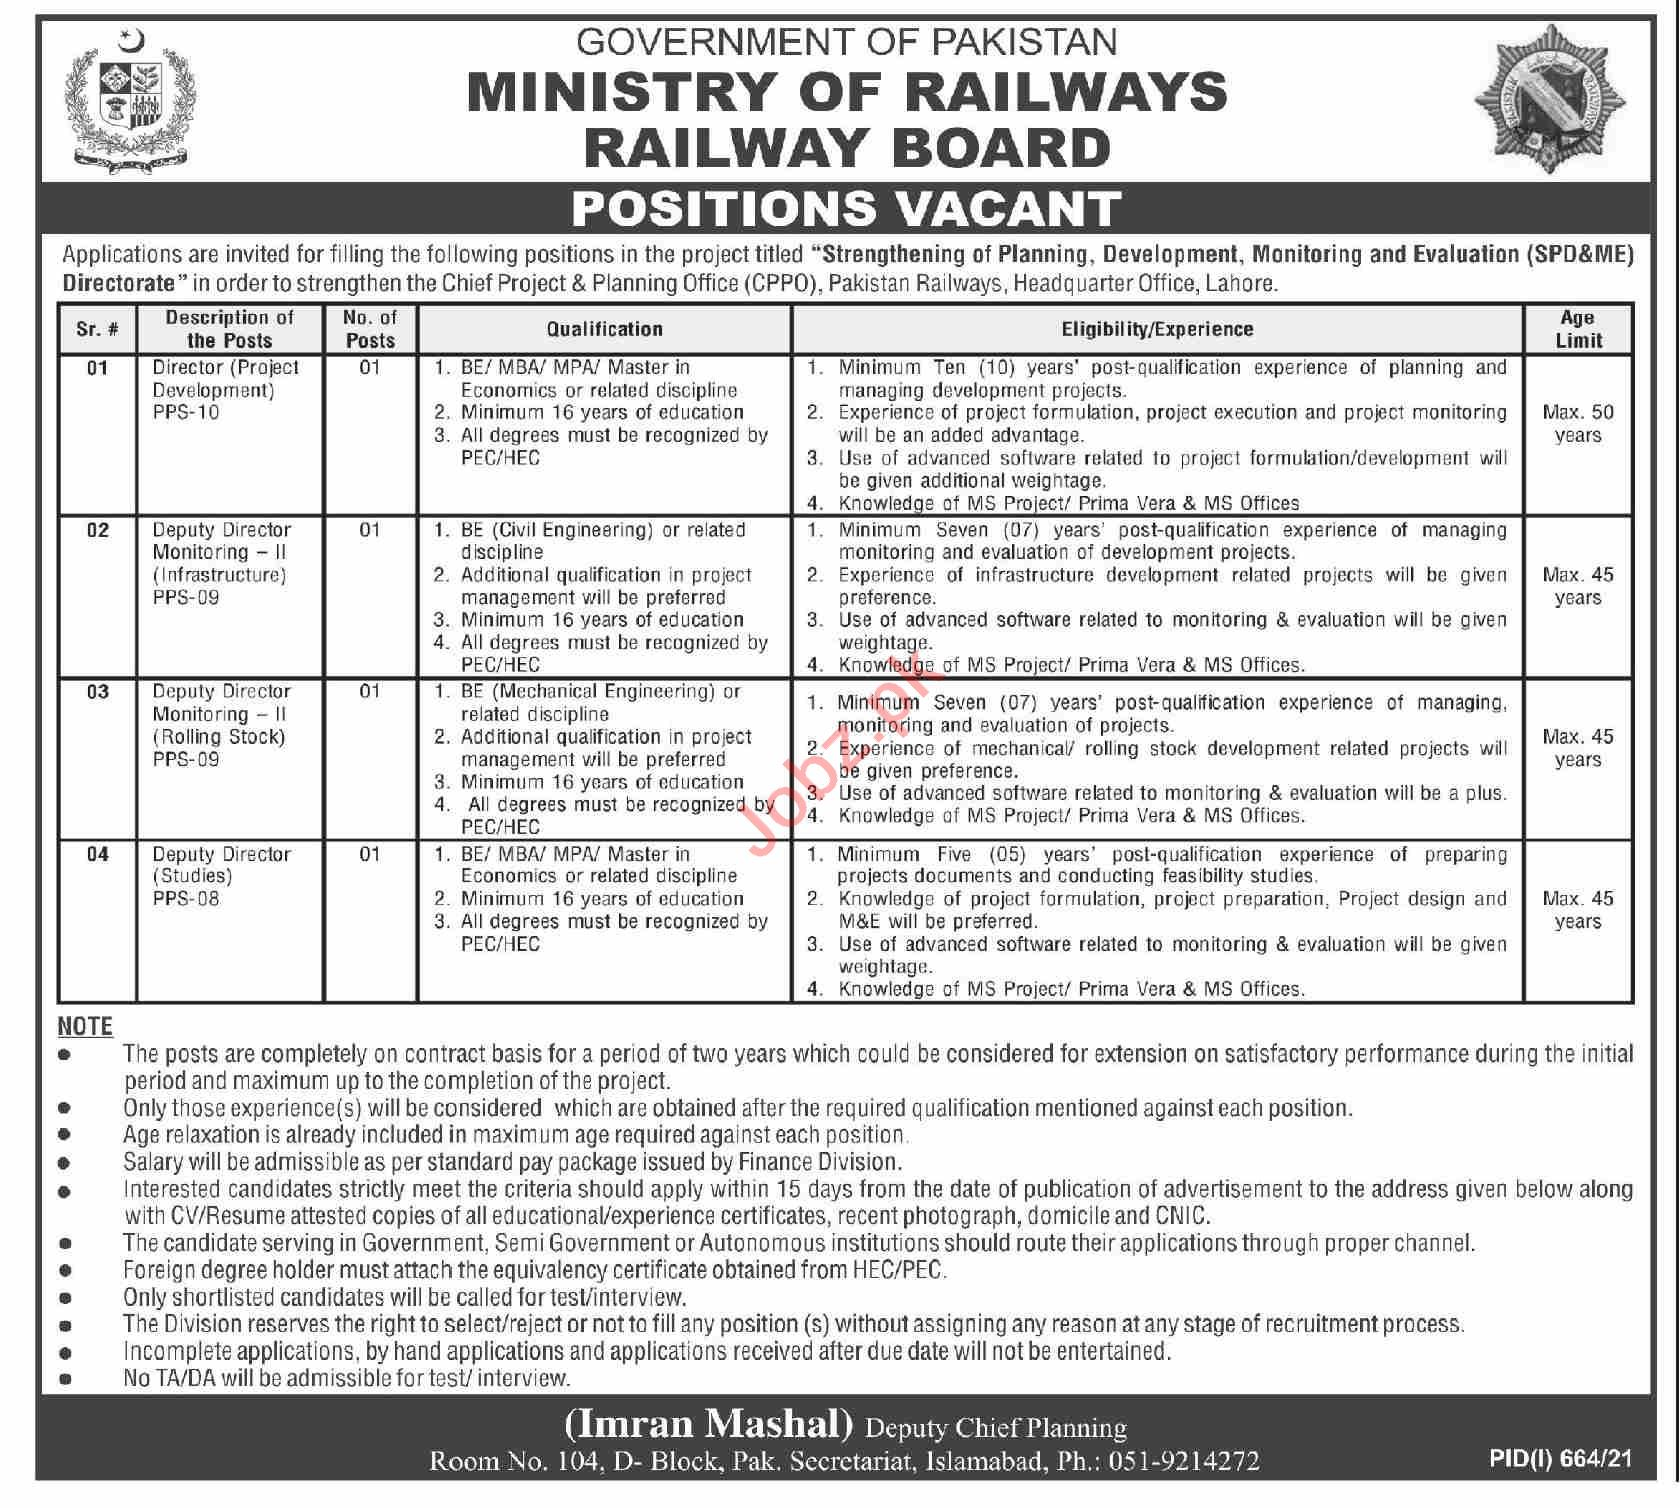 Pakistan Railways Ministry of Railways Islamabad Jobs 2021